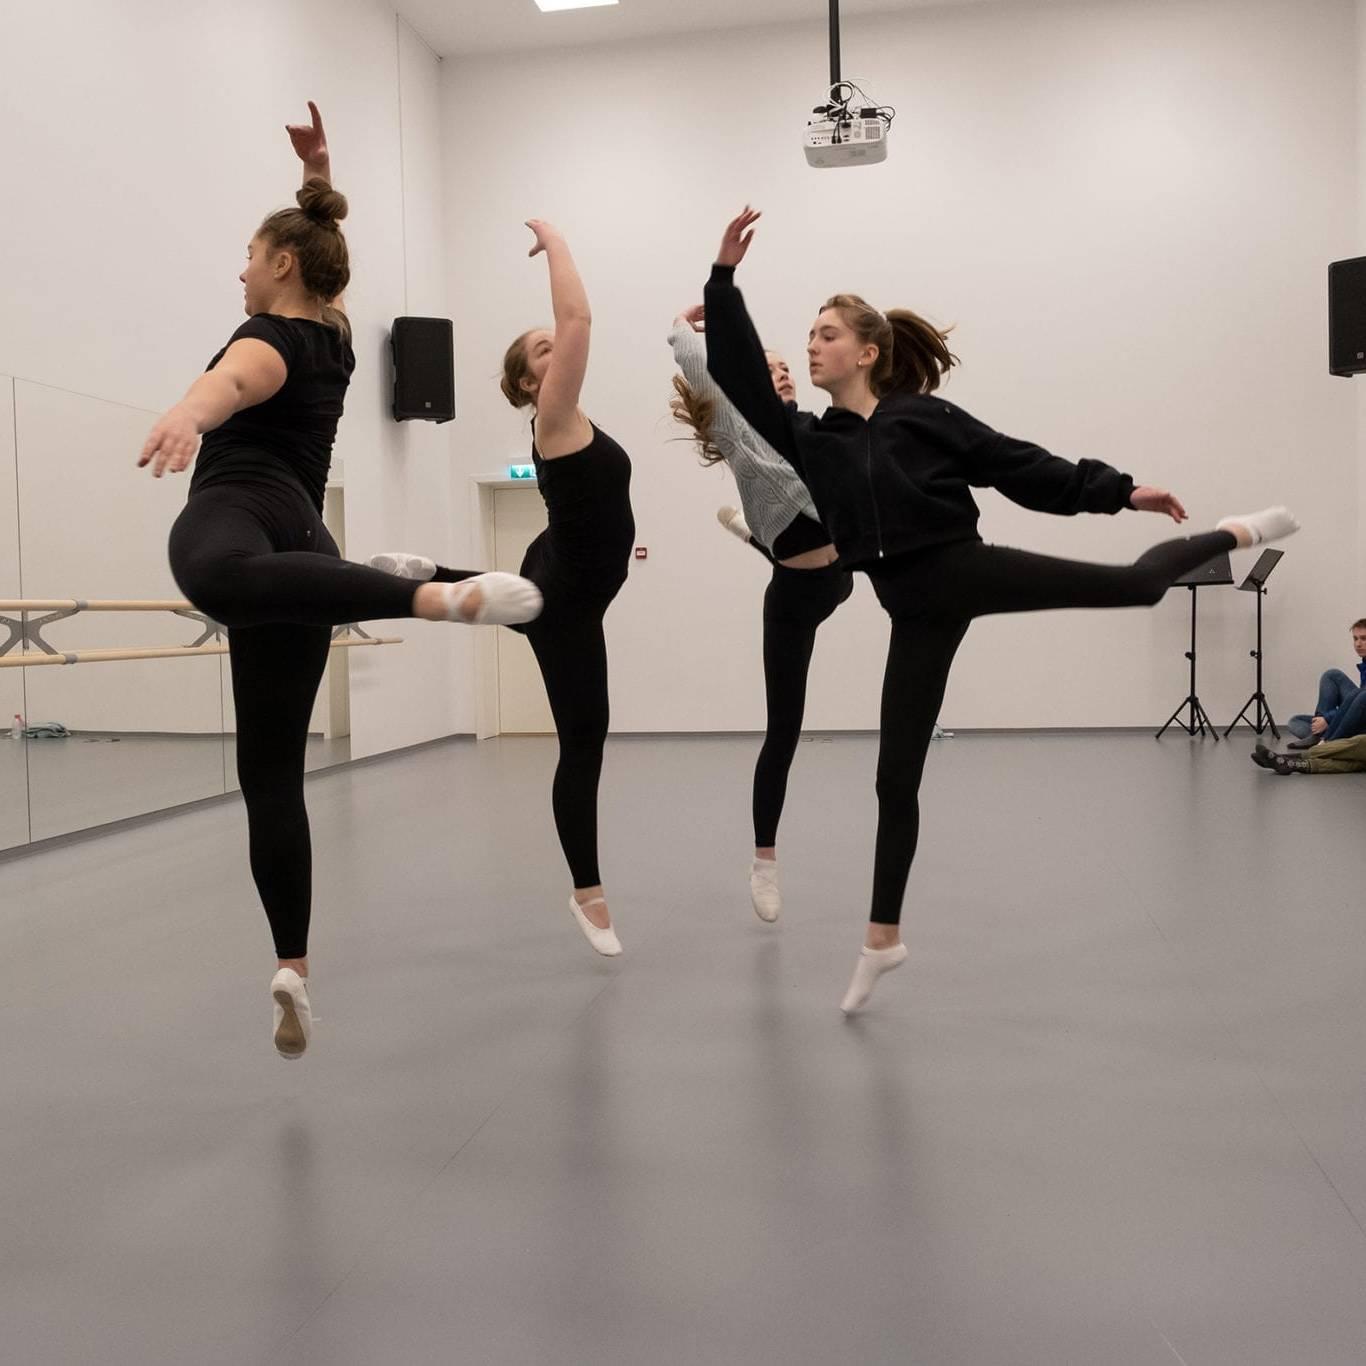 Ballettgruppa Supra er de eldste ballettelevene ved Røros kulturskole. Foto: Trine Lysholm Hagan.